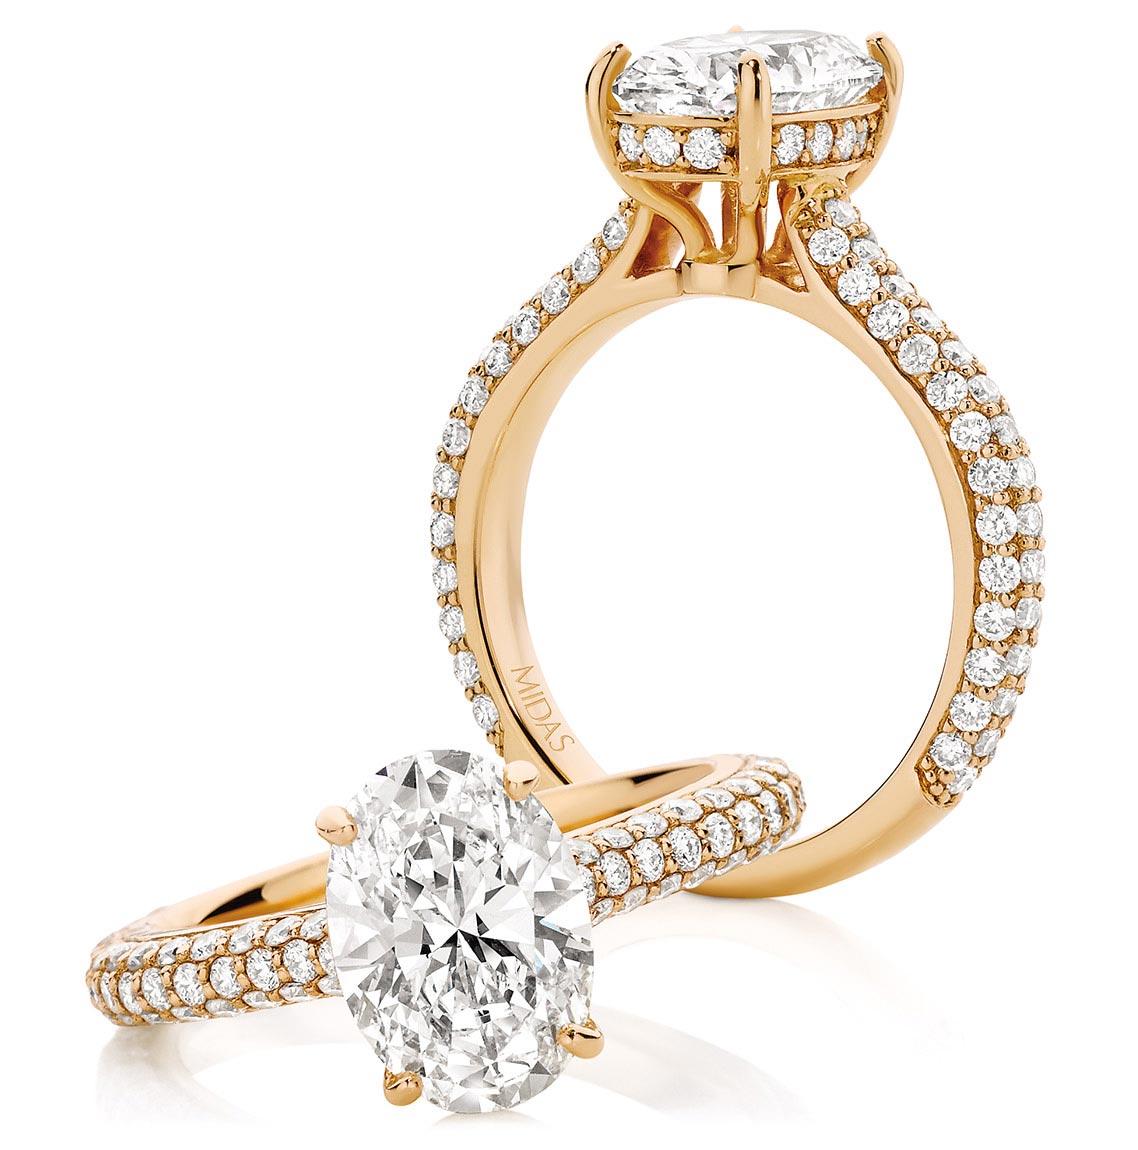 Diamond Engagement Rings Sydney Midas Jewellery